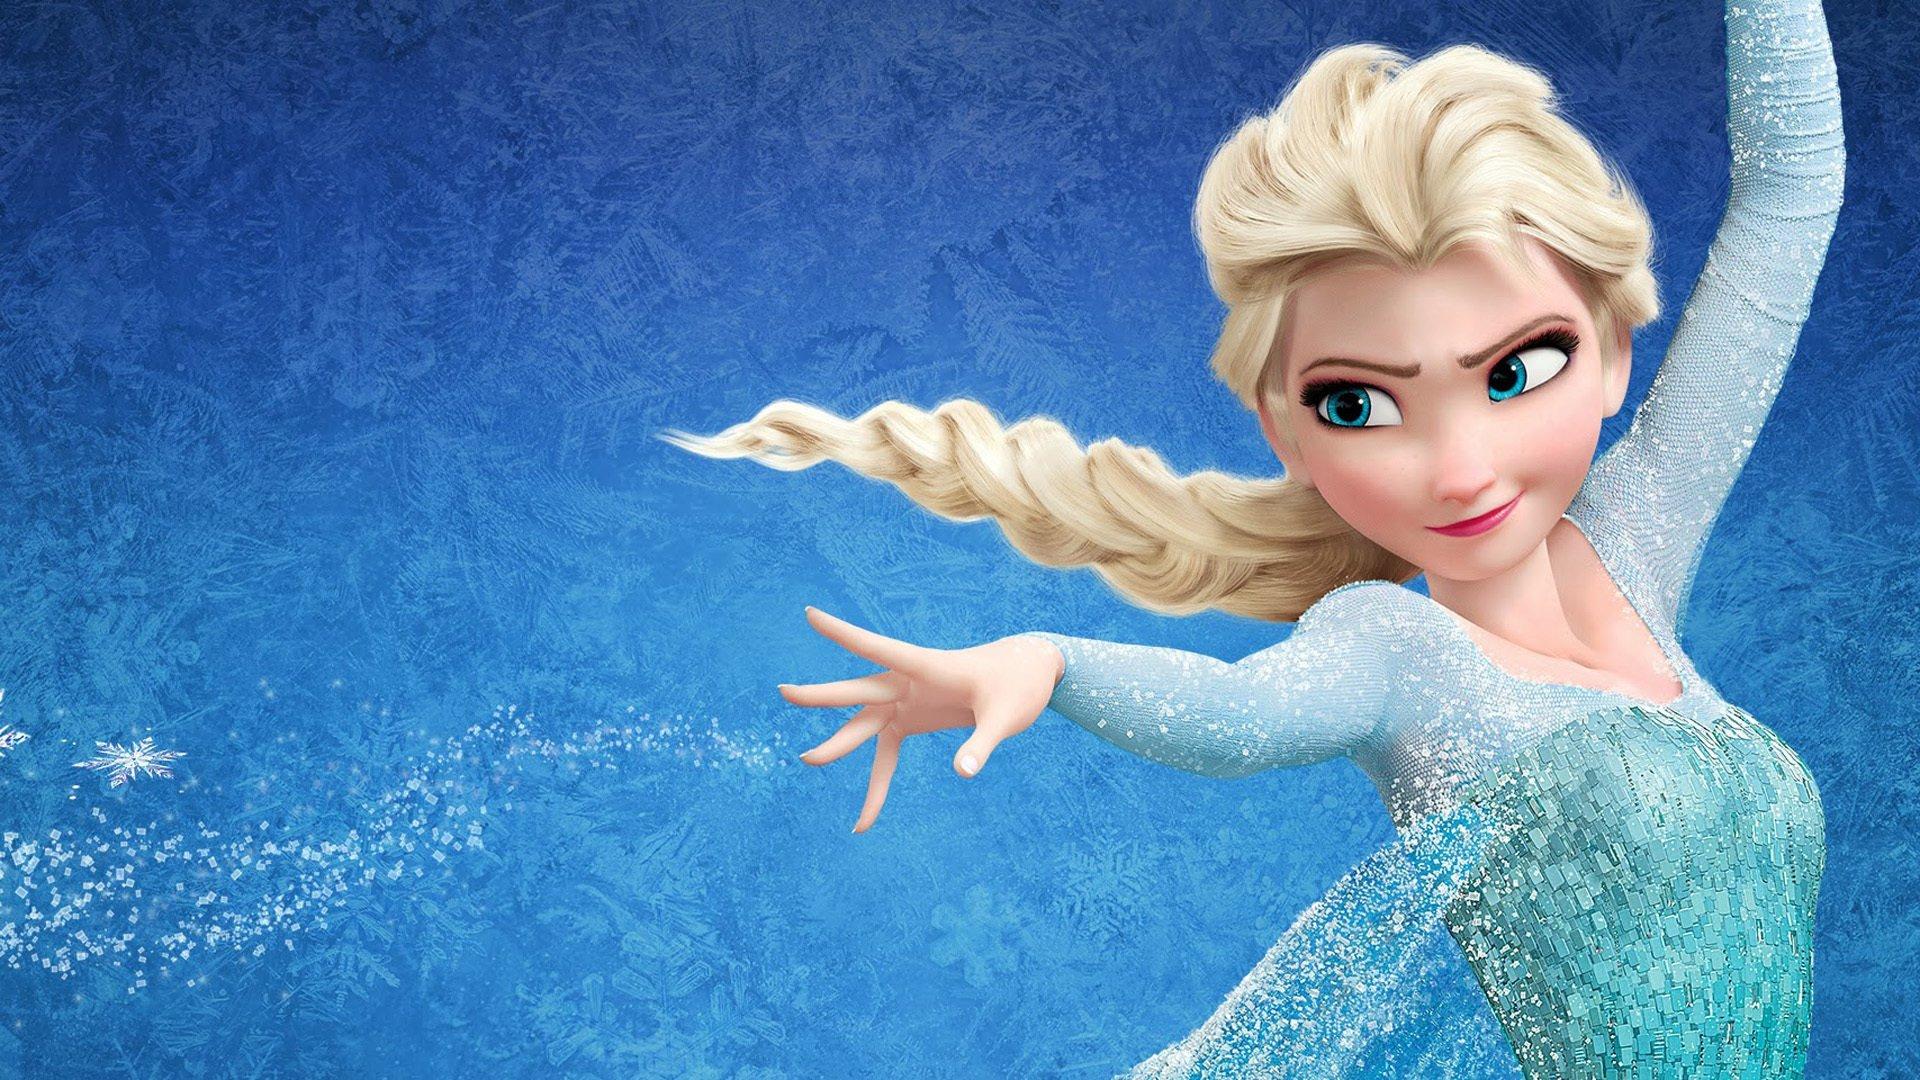 Free Elsa Frozen High Quality Wallpaper Id 380010 For Full Hd